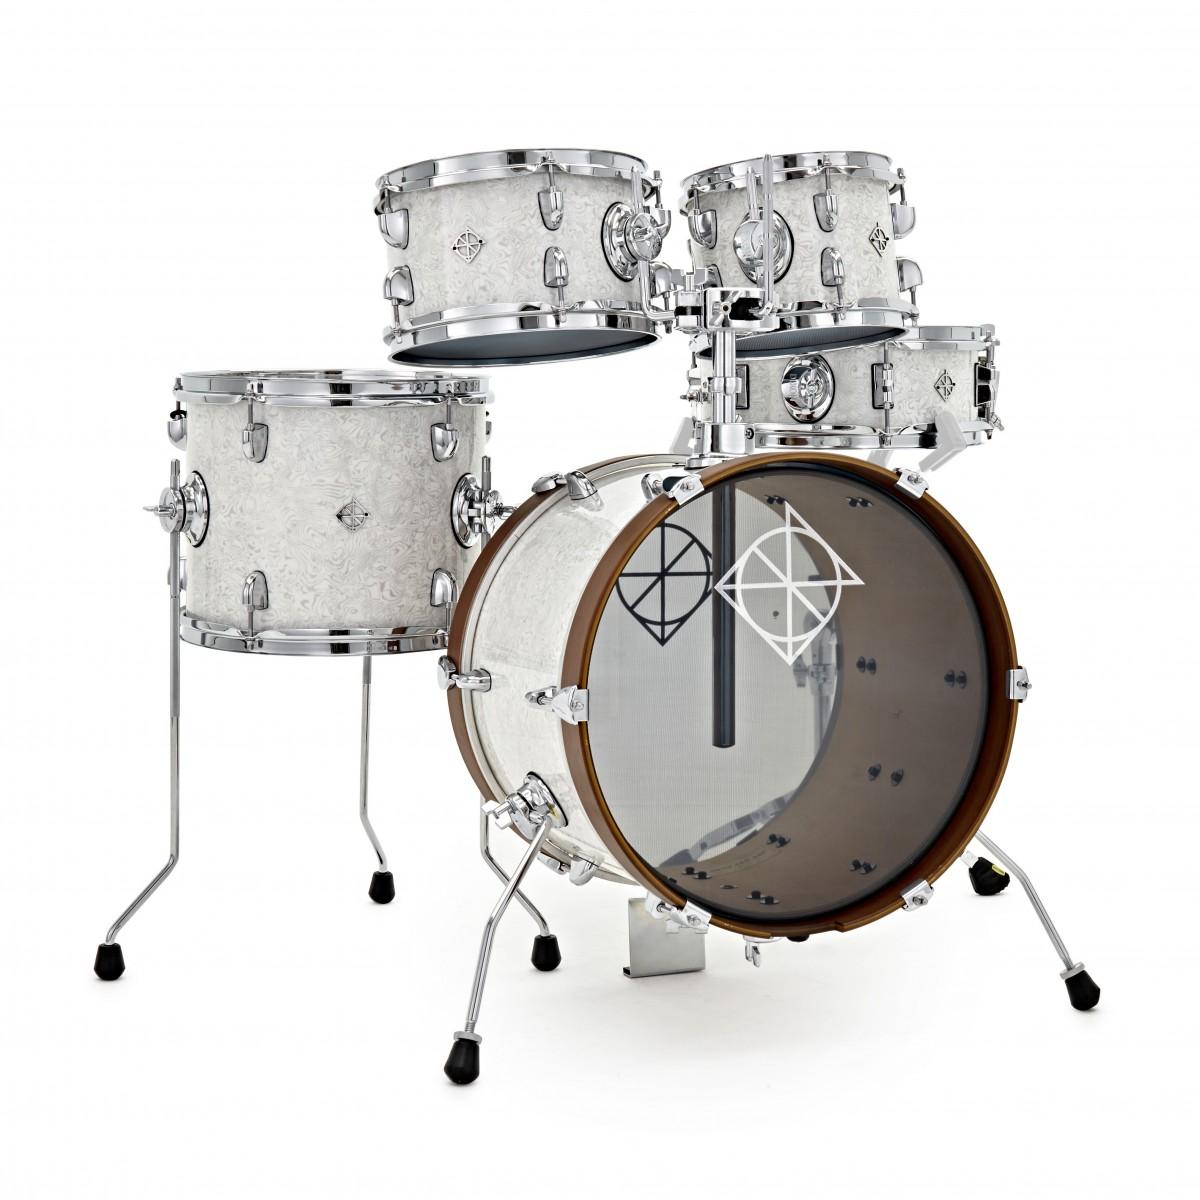 Dixon Drums Jet Set Plus 5pc Shell Pack, Sub Zero White